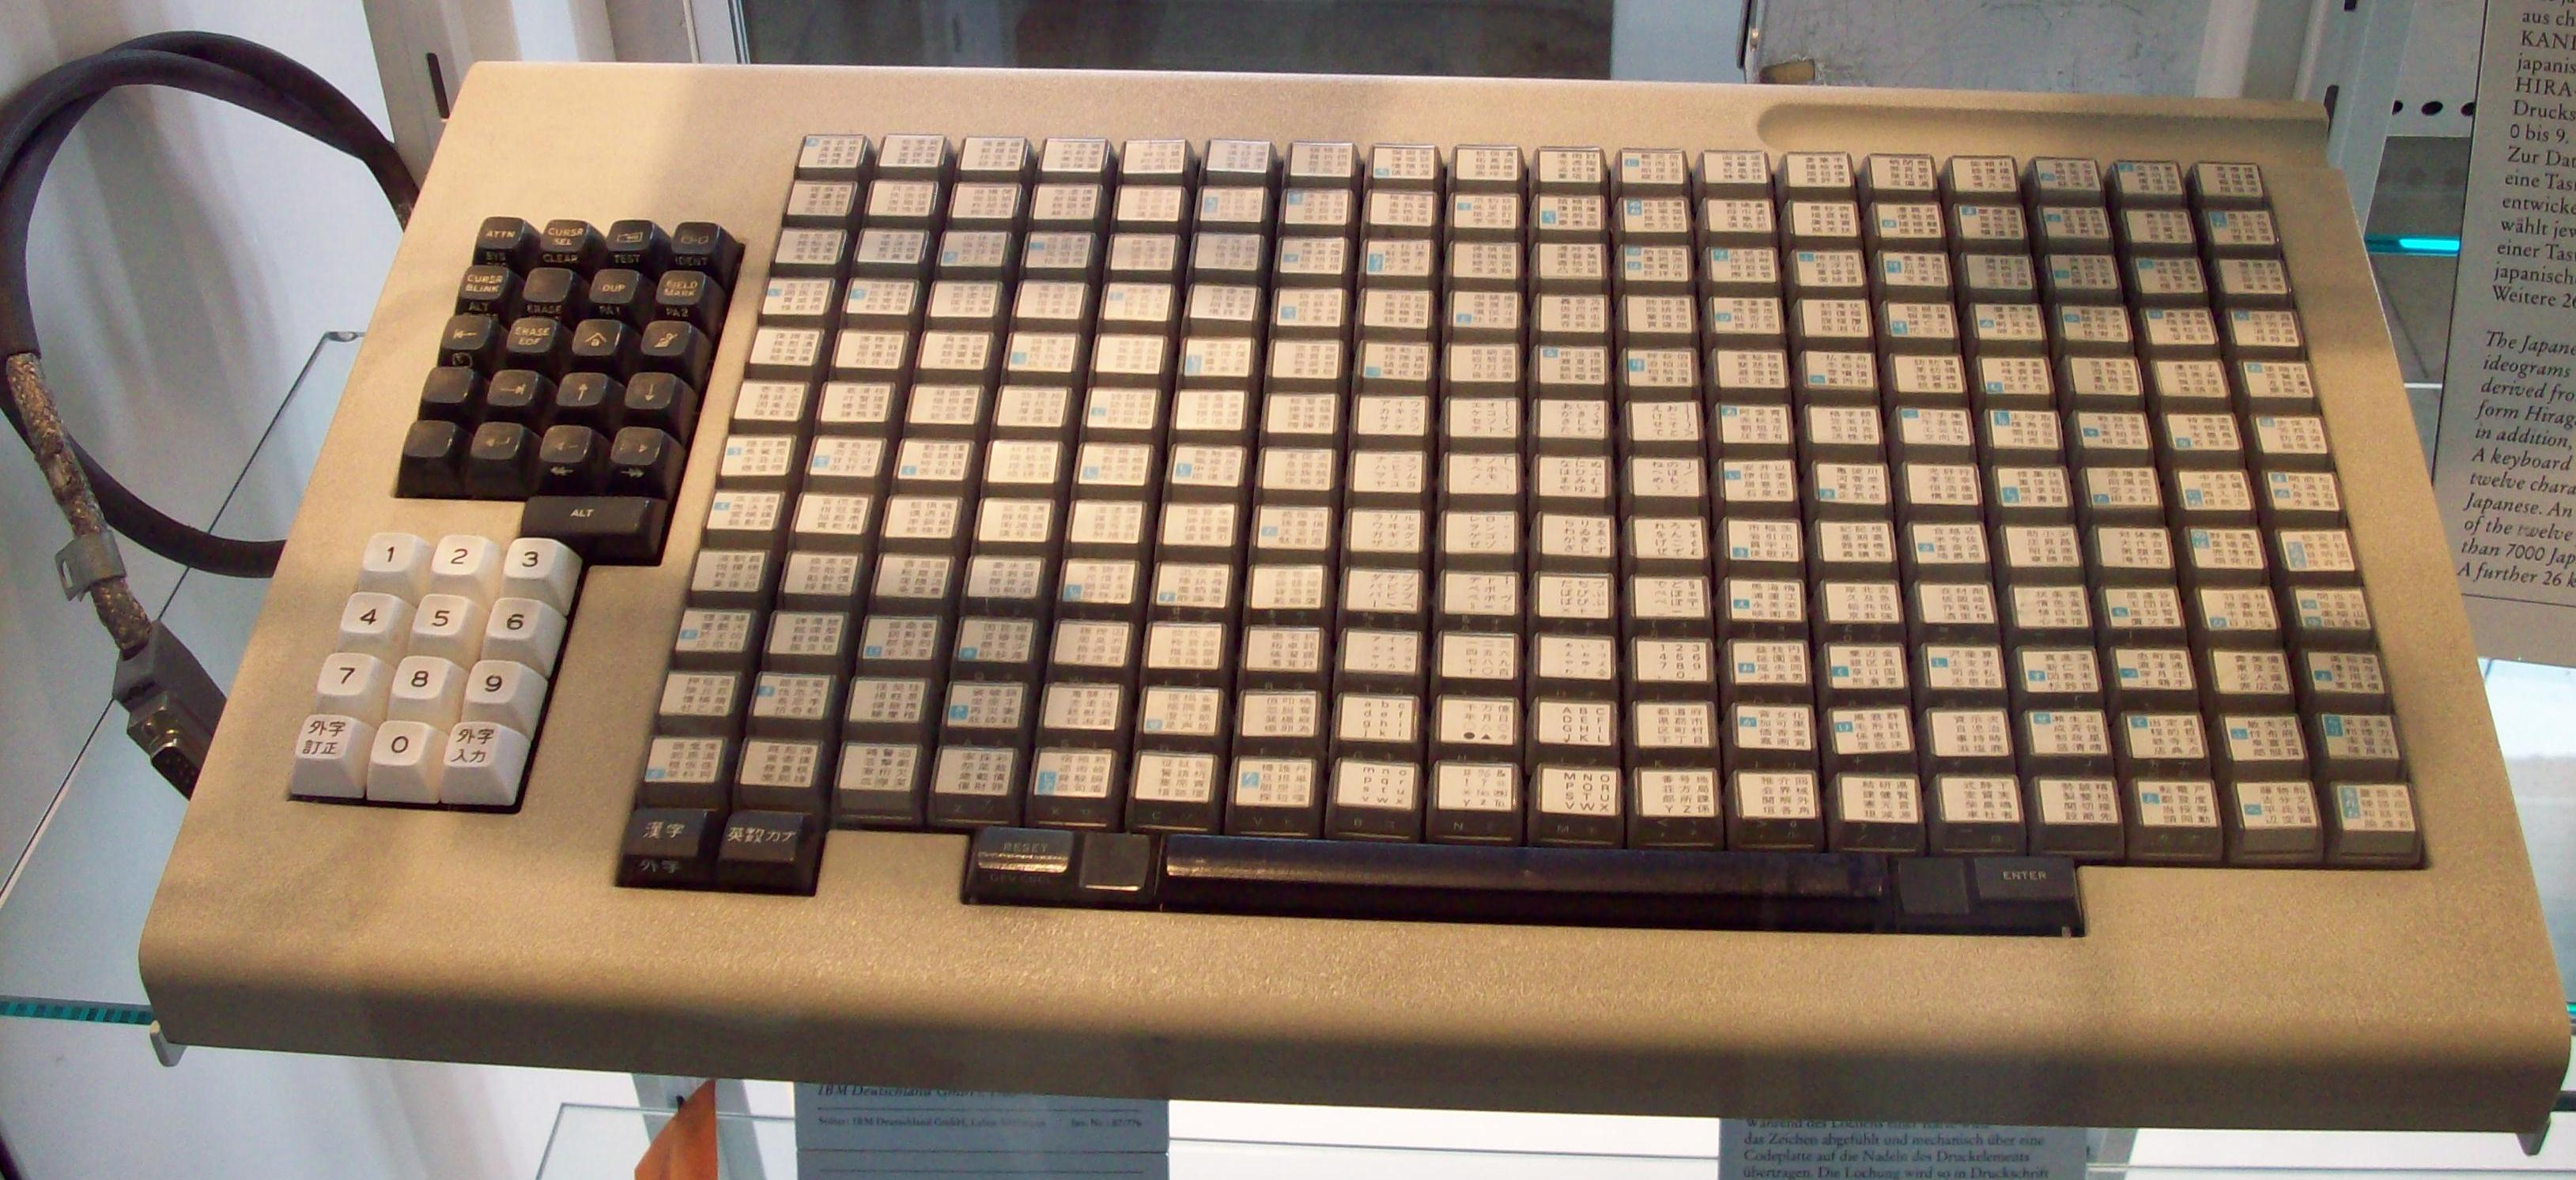 200801191443_Japanische_Tastatur.jpeg